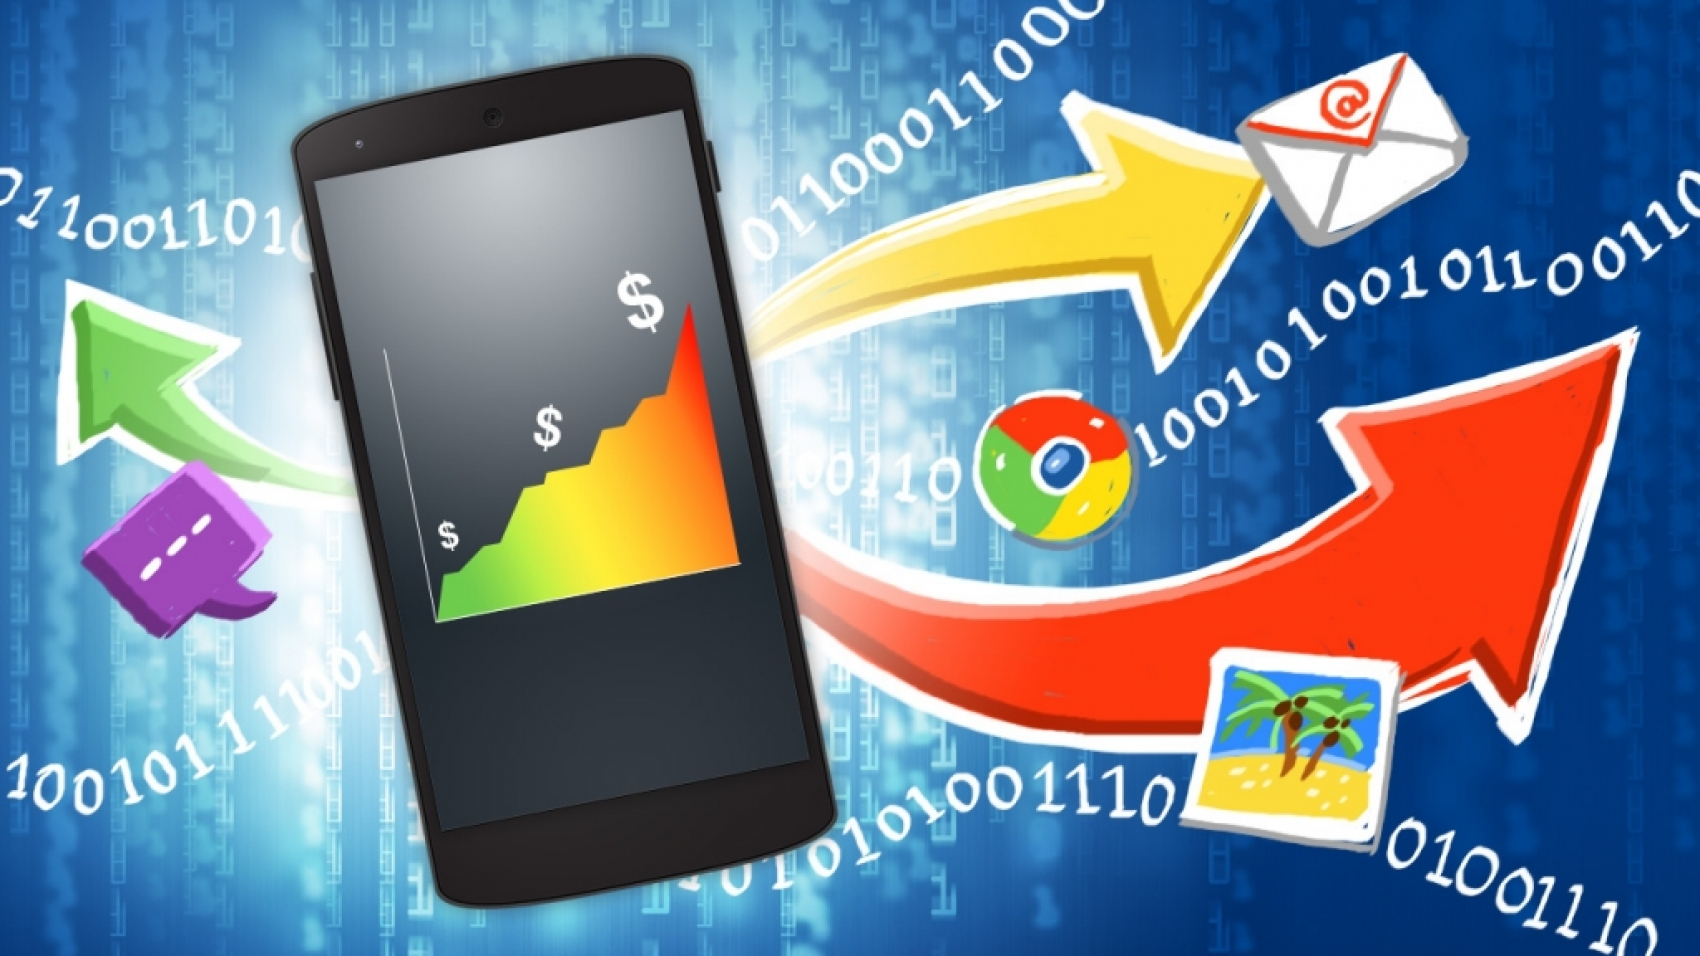 Mobile Data Consumption